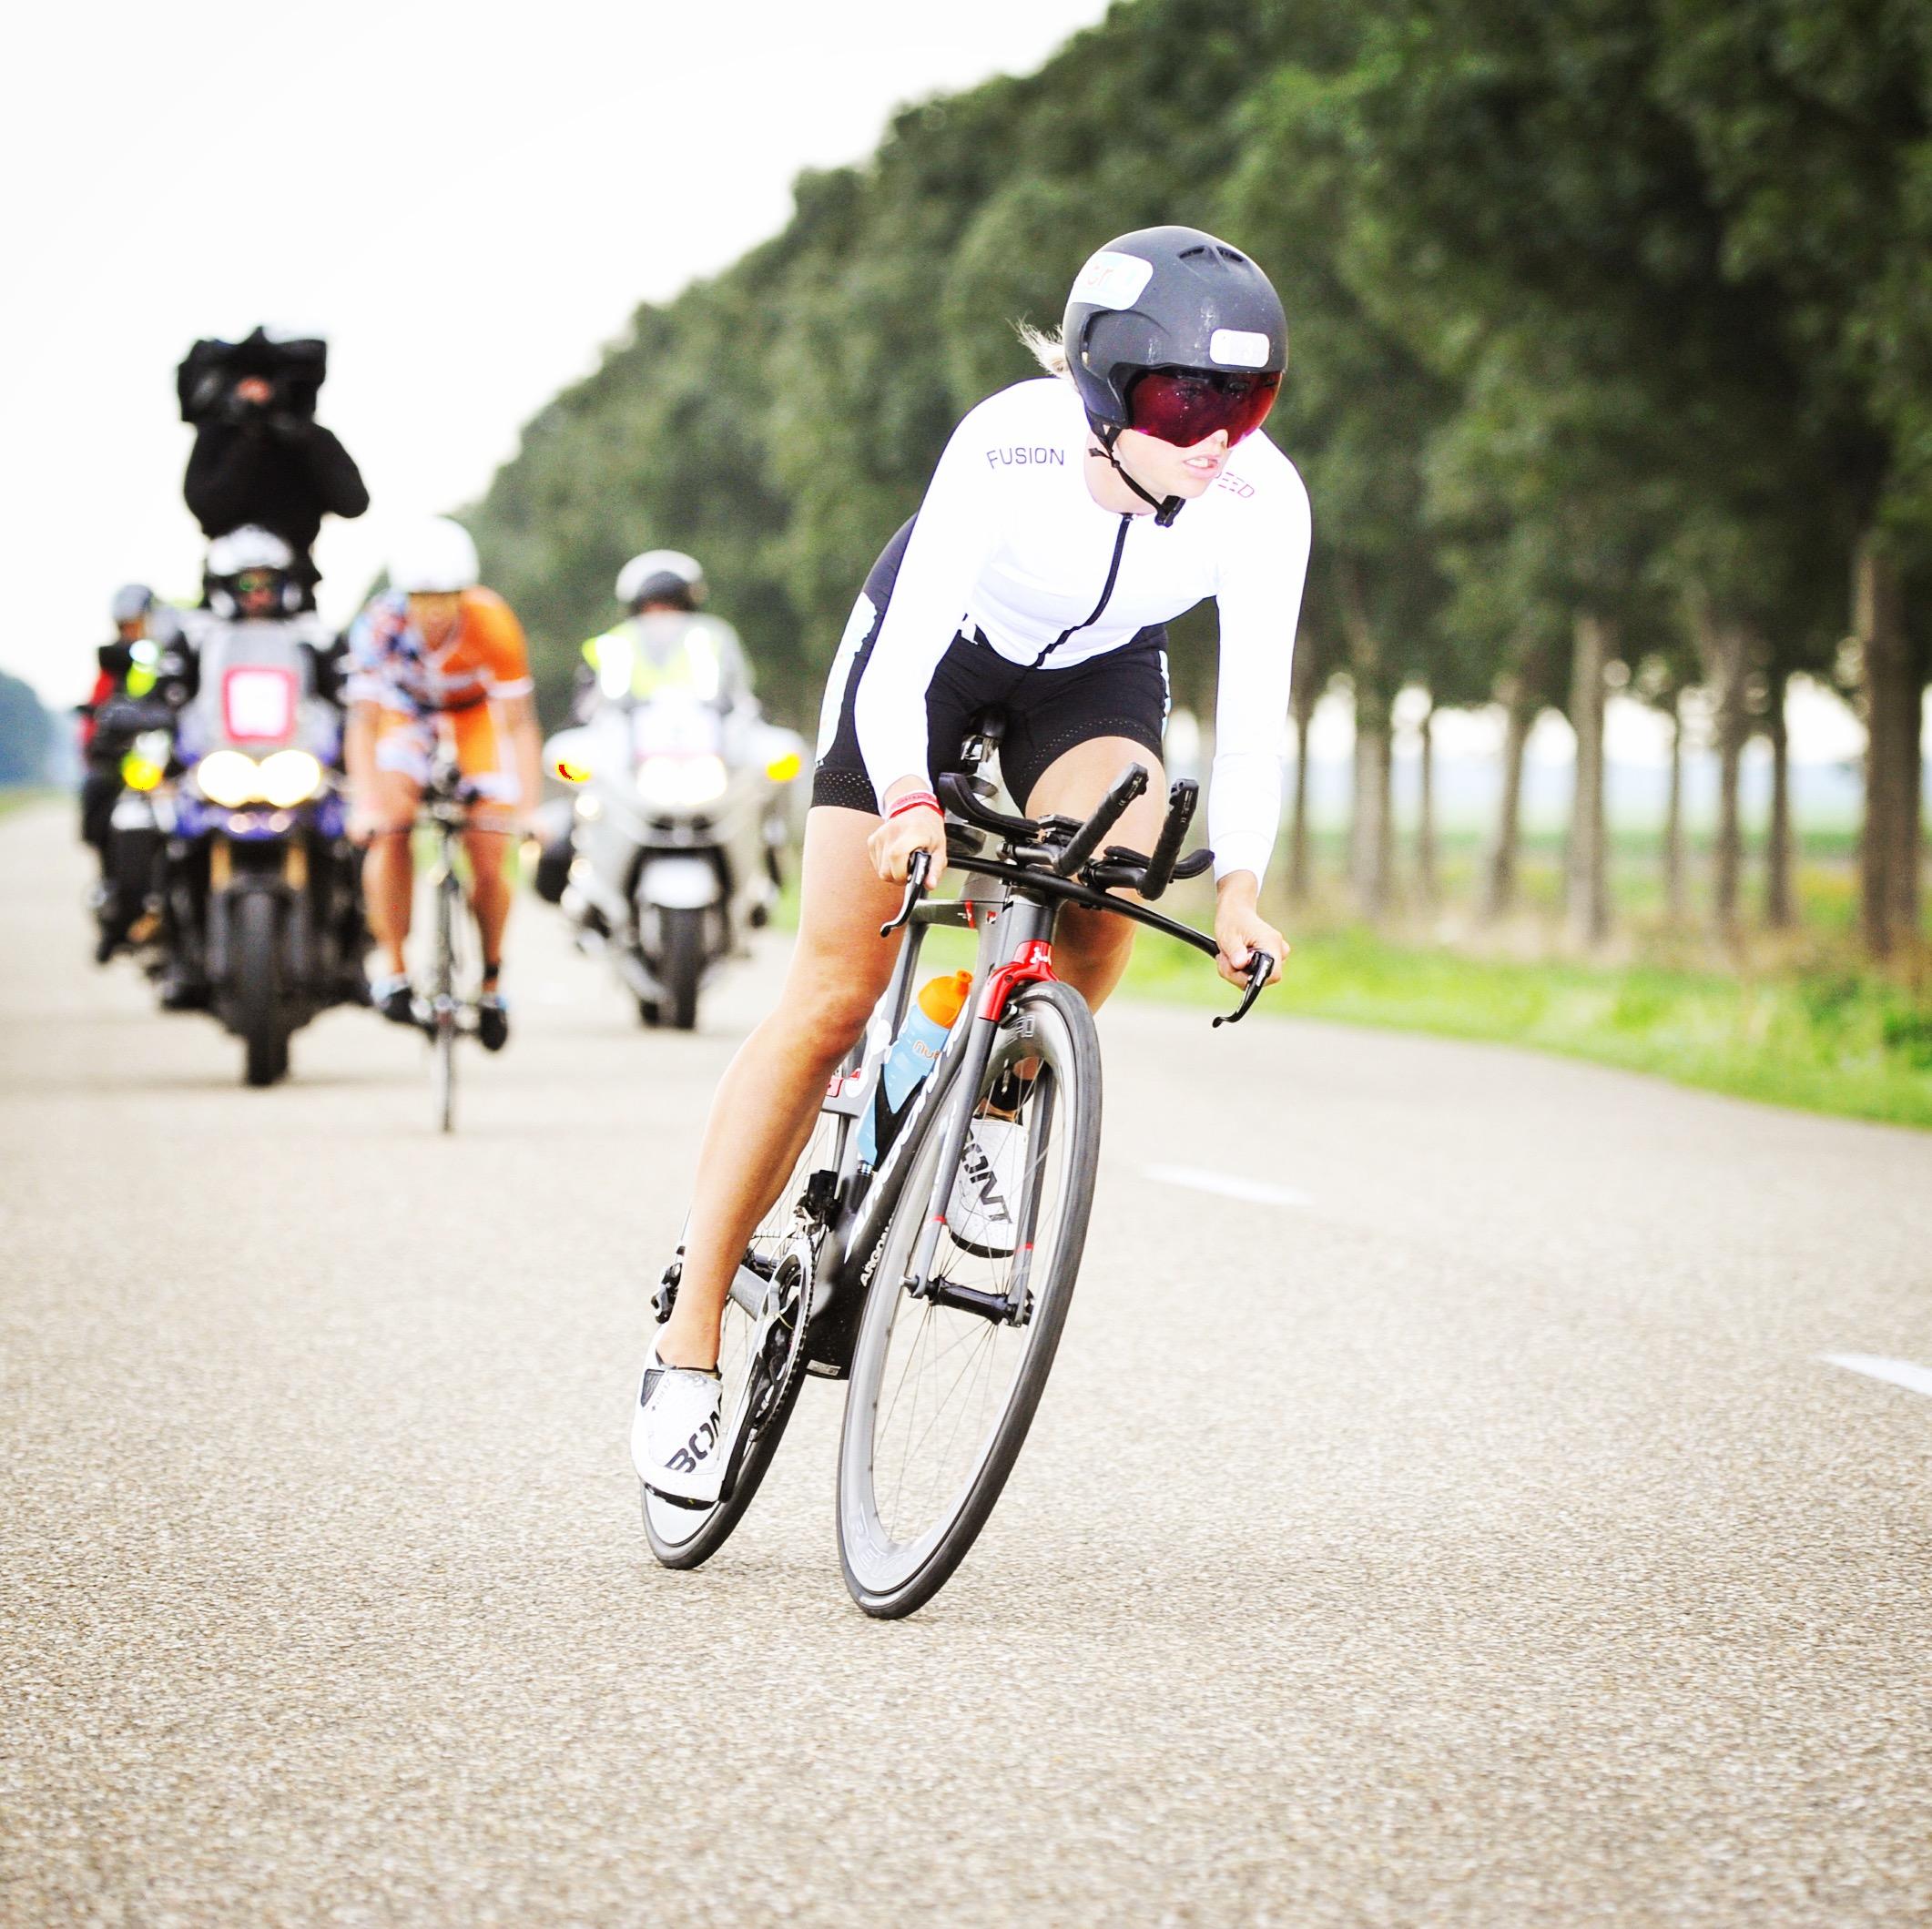 Challenge Almere-Amsterdam, Full Distance, 2nd